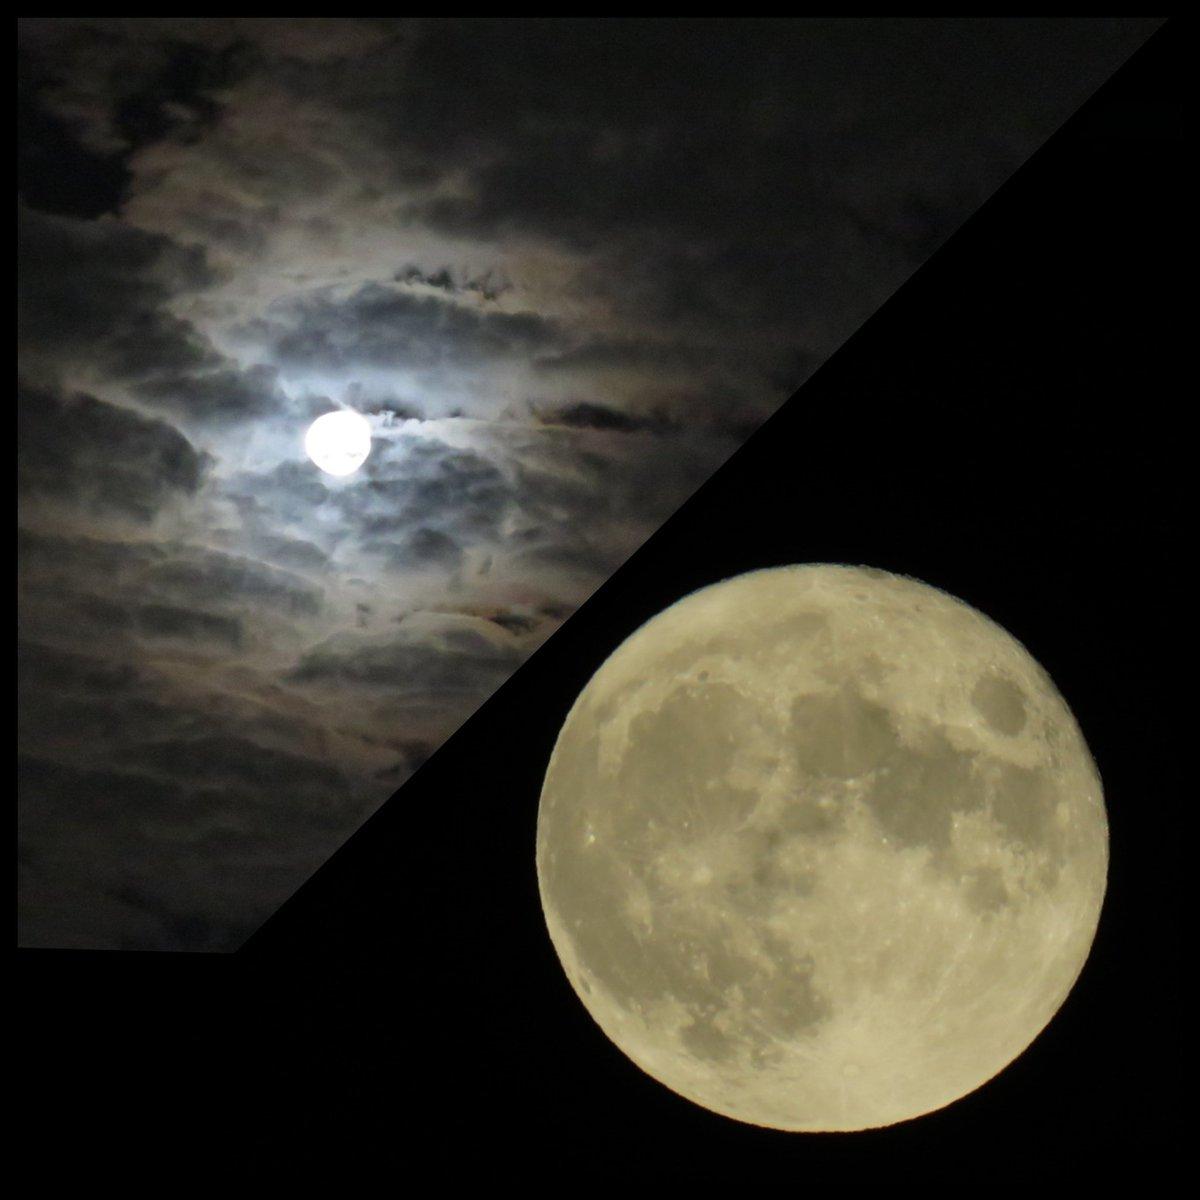 RT @orichan325: 中秋の名月と満月が重なったんですね✨  #中秋の名月 #満月 #CanonPowerShotSX60HS  📷2021.9.21...